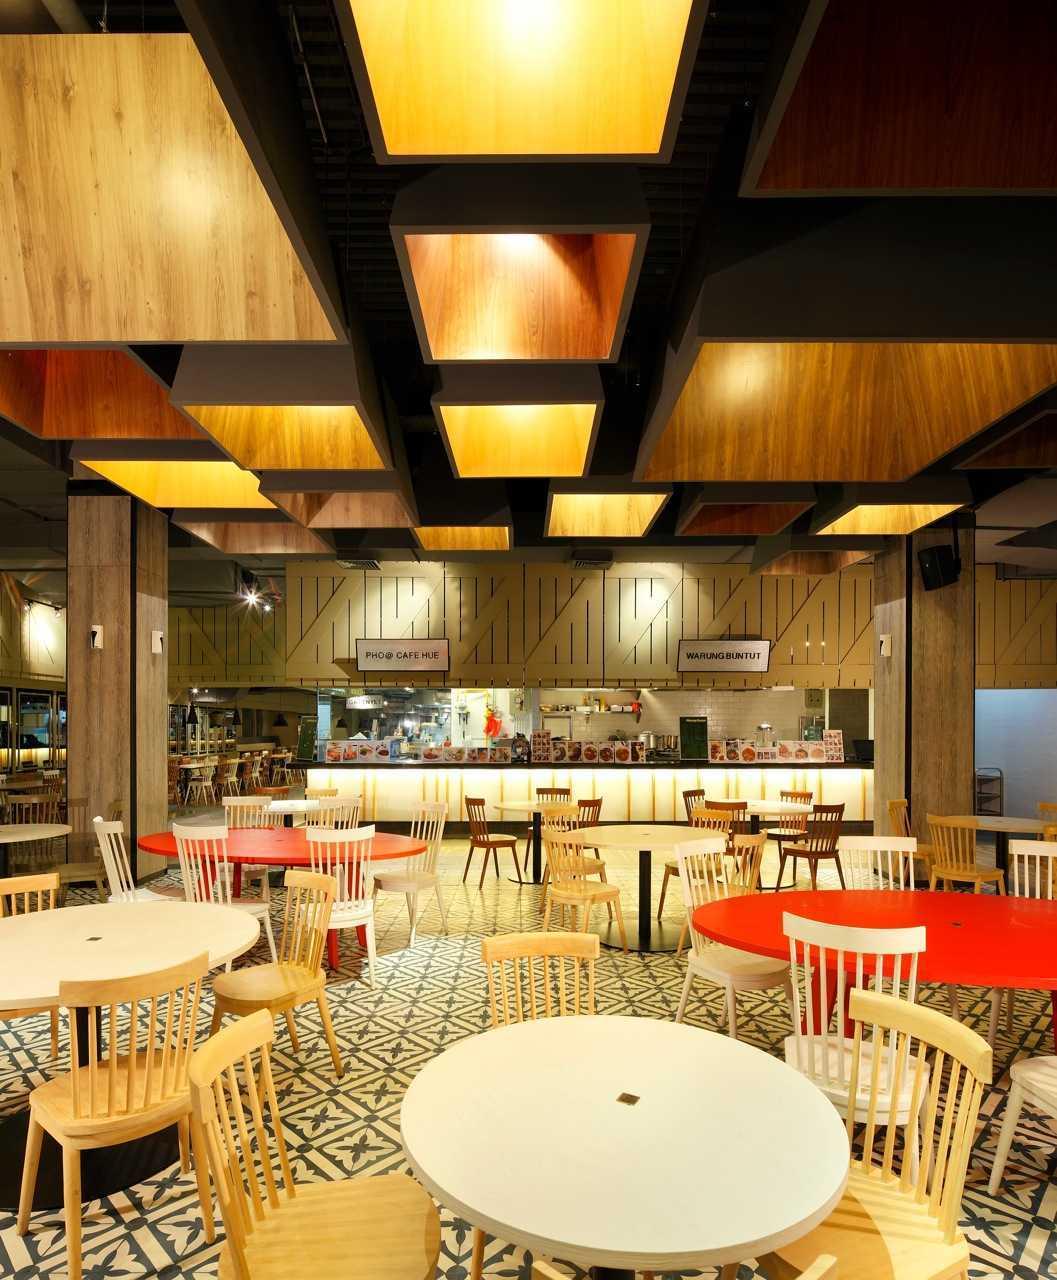 Ma-Ru Urban Kitchen  Plaza Indonesia Plaza Indonesia Seating Area Restaurant  15336